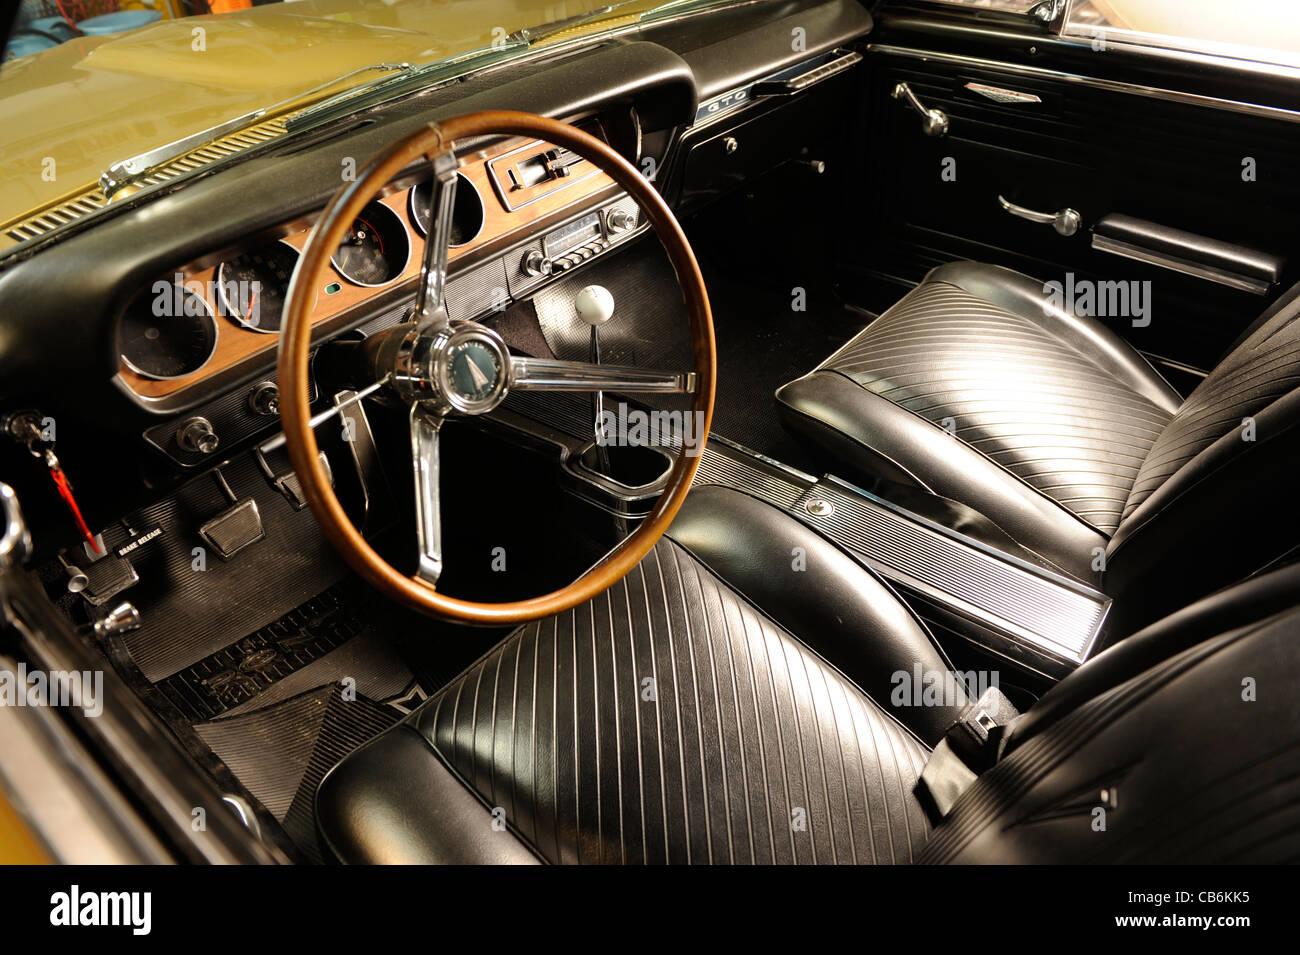 1965 pontiac gto 2 door hrd top, gold tiger edition, hurst.